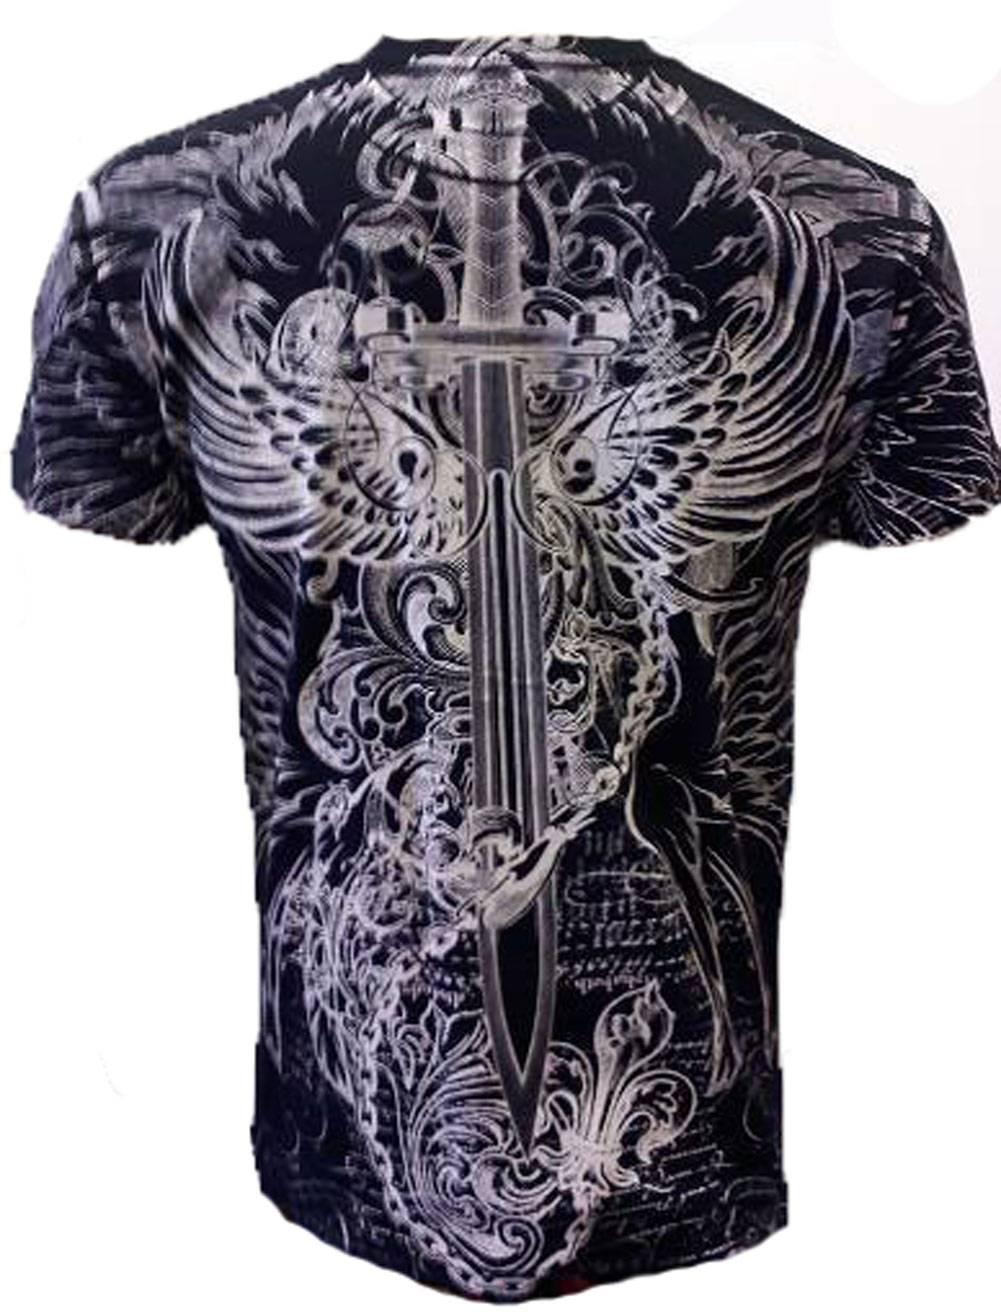 Konflic-NWT-Men-039-s-Eagle-Defender-Graphic-Designer-MMA-Muscle-Crewneck-T-shirt thumbnail 4